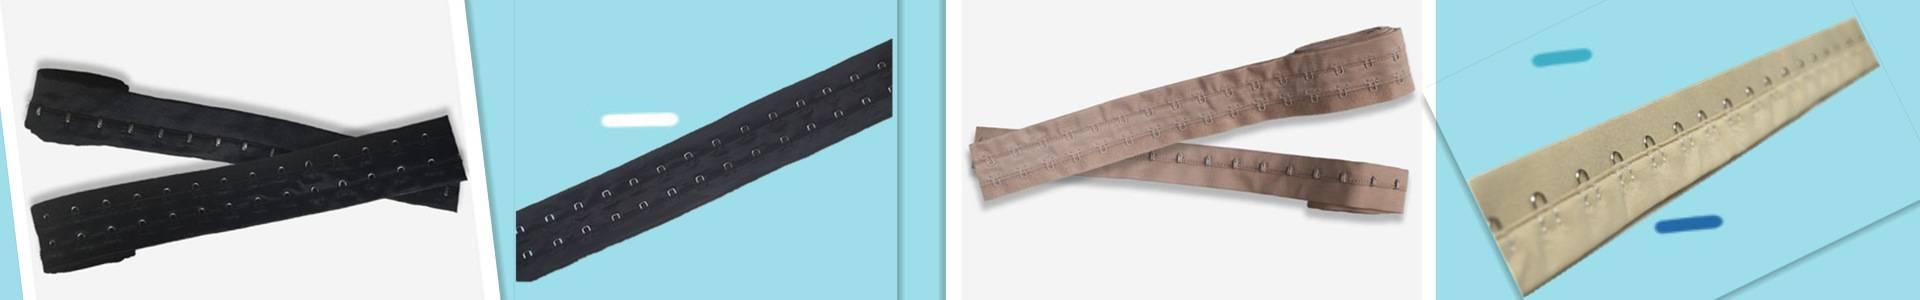 Manufacturing Of Sewing Hook And Eye Tape & Bra Extension Hooks-Mayrose